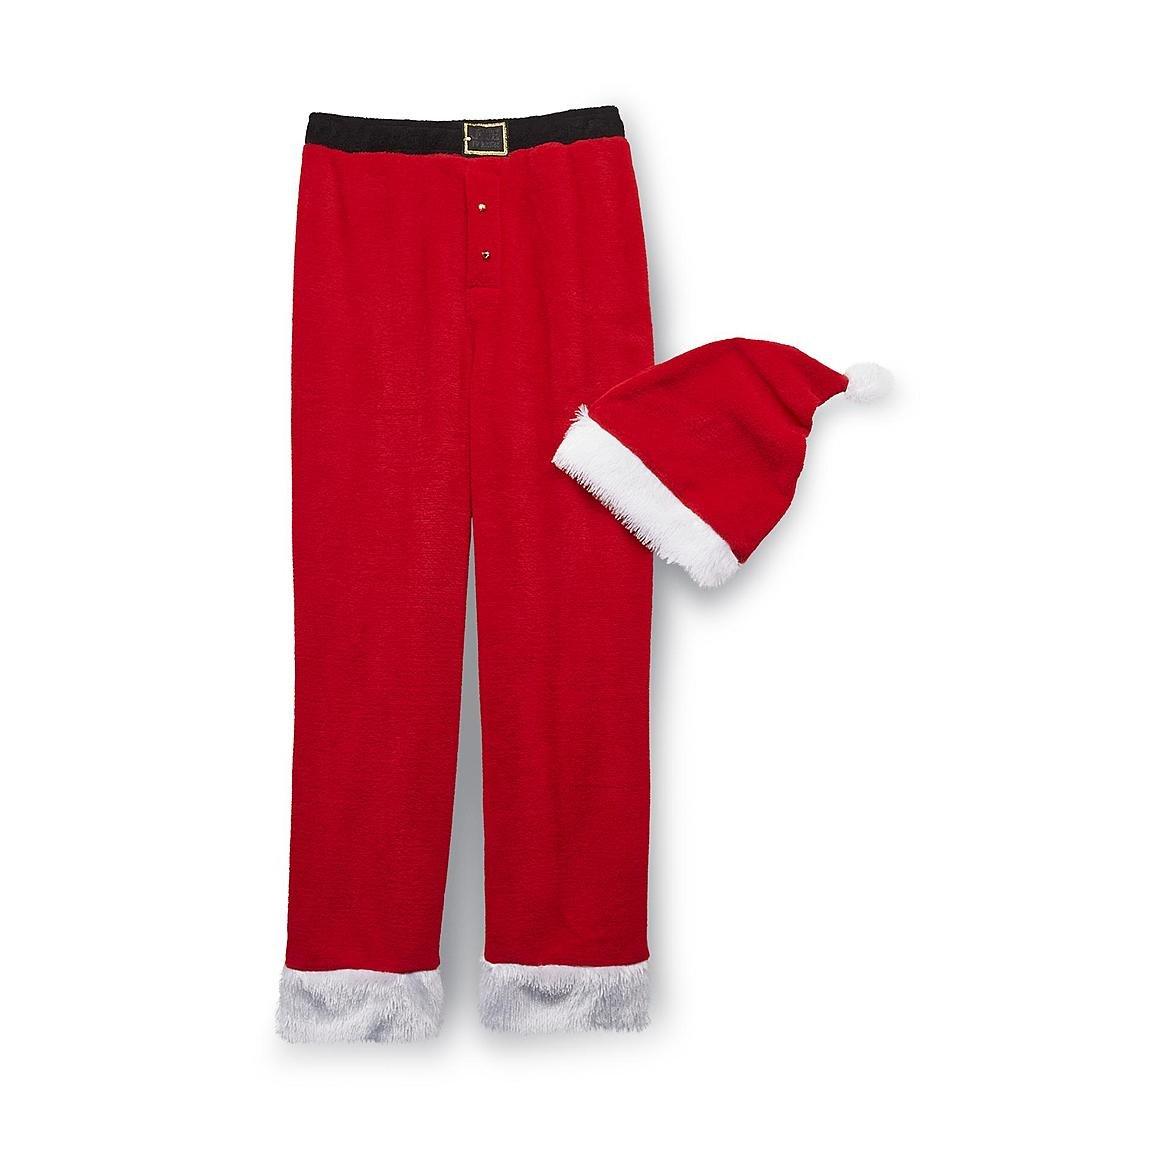 Joe Boxer Men\'s Christmas Pajamas Bottoms Lounge Pants and Matching ...